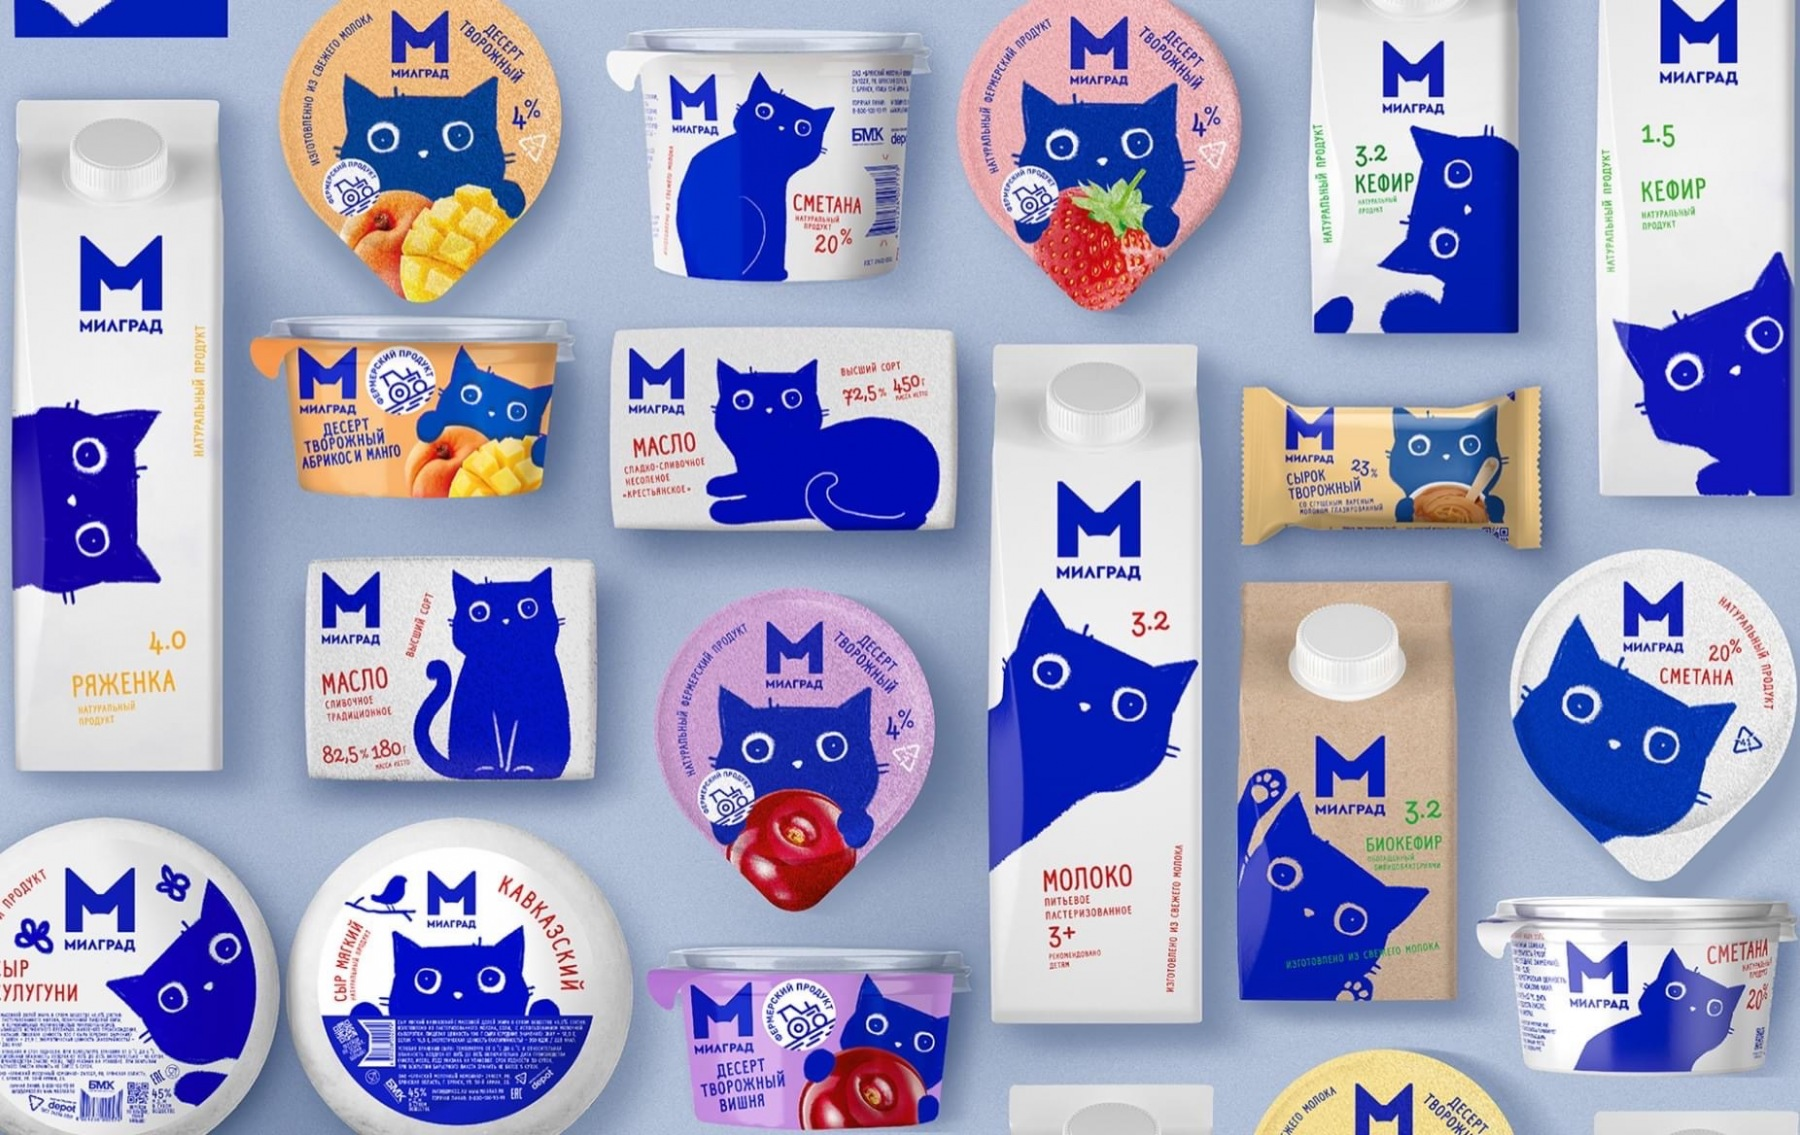 cat-milk-package-05